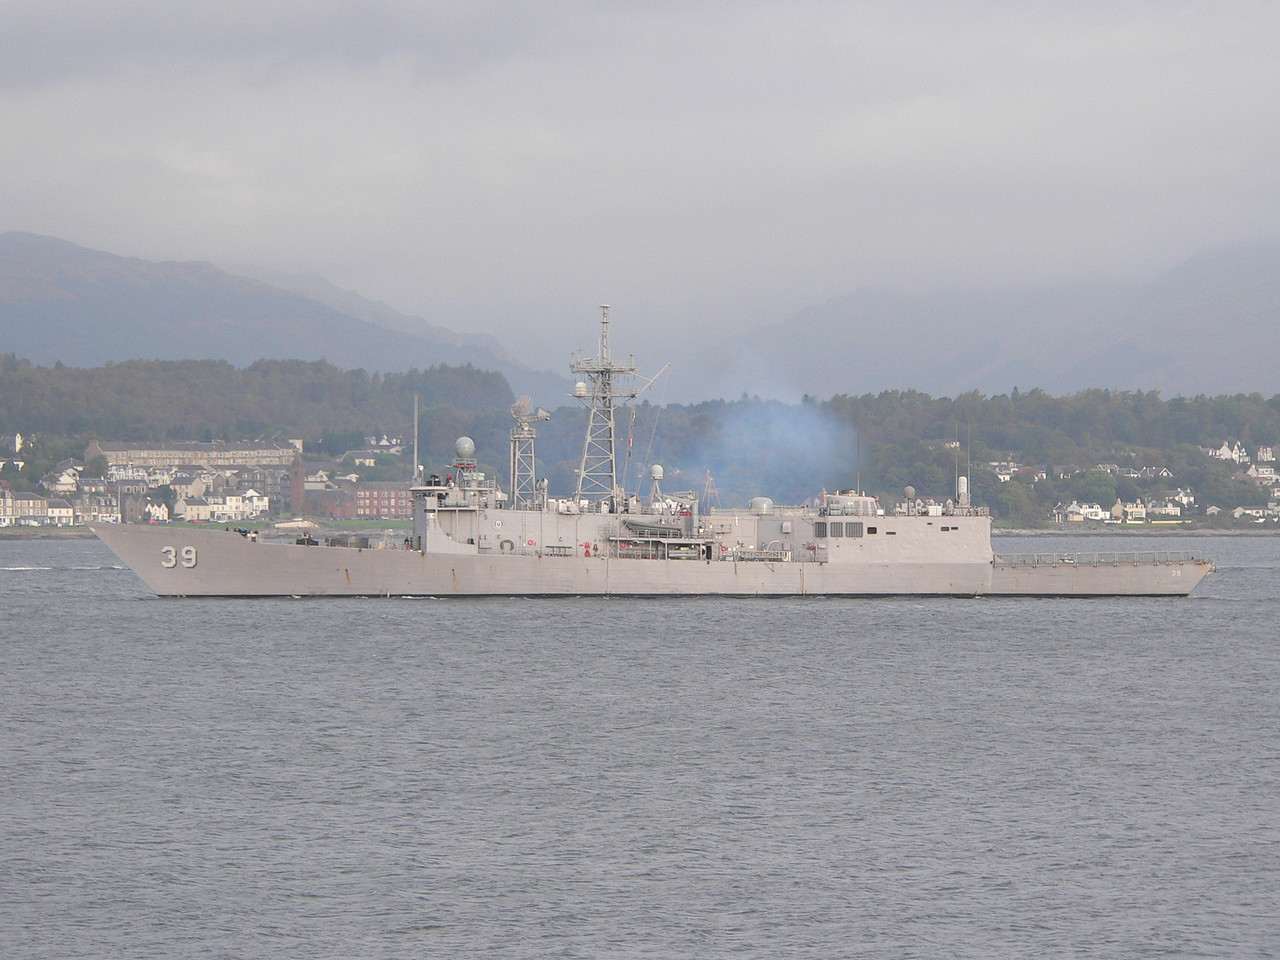 FFG-39 USS DOYLE